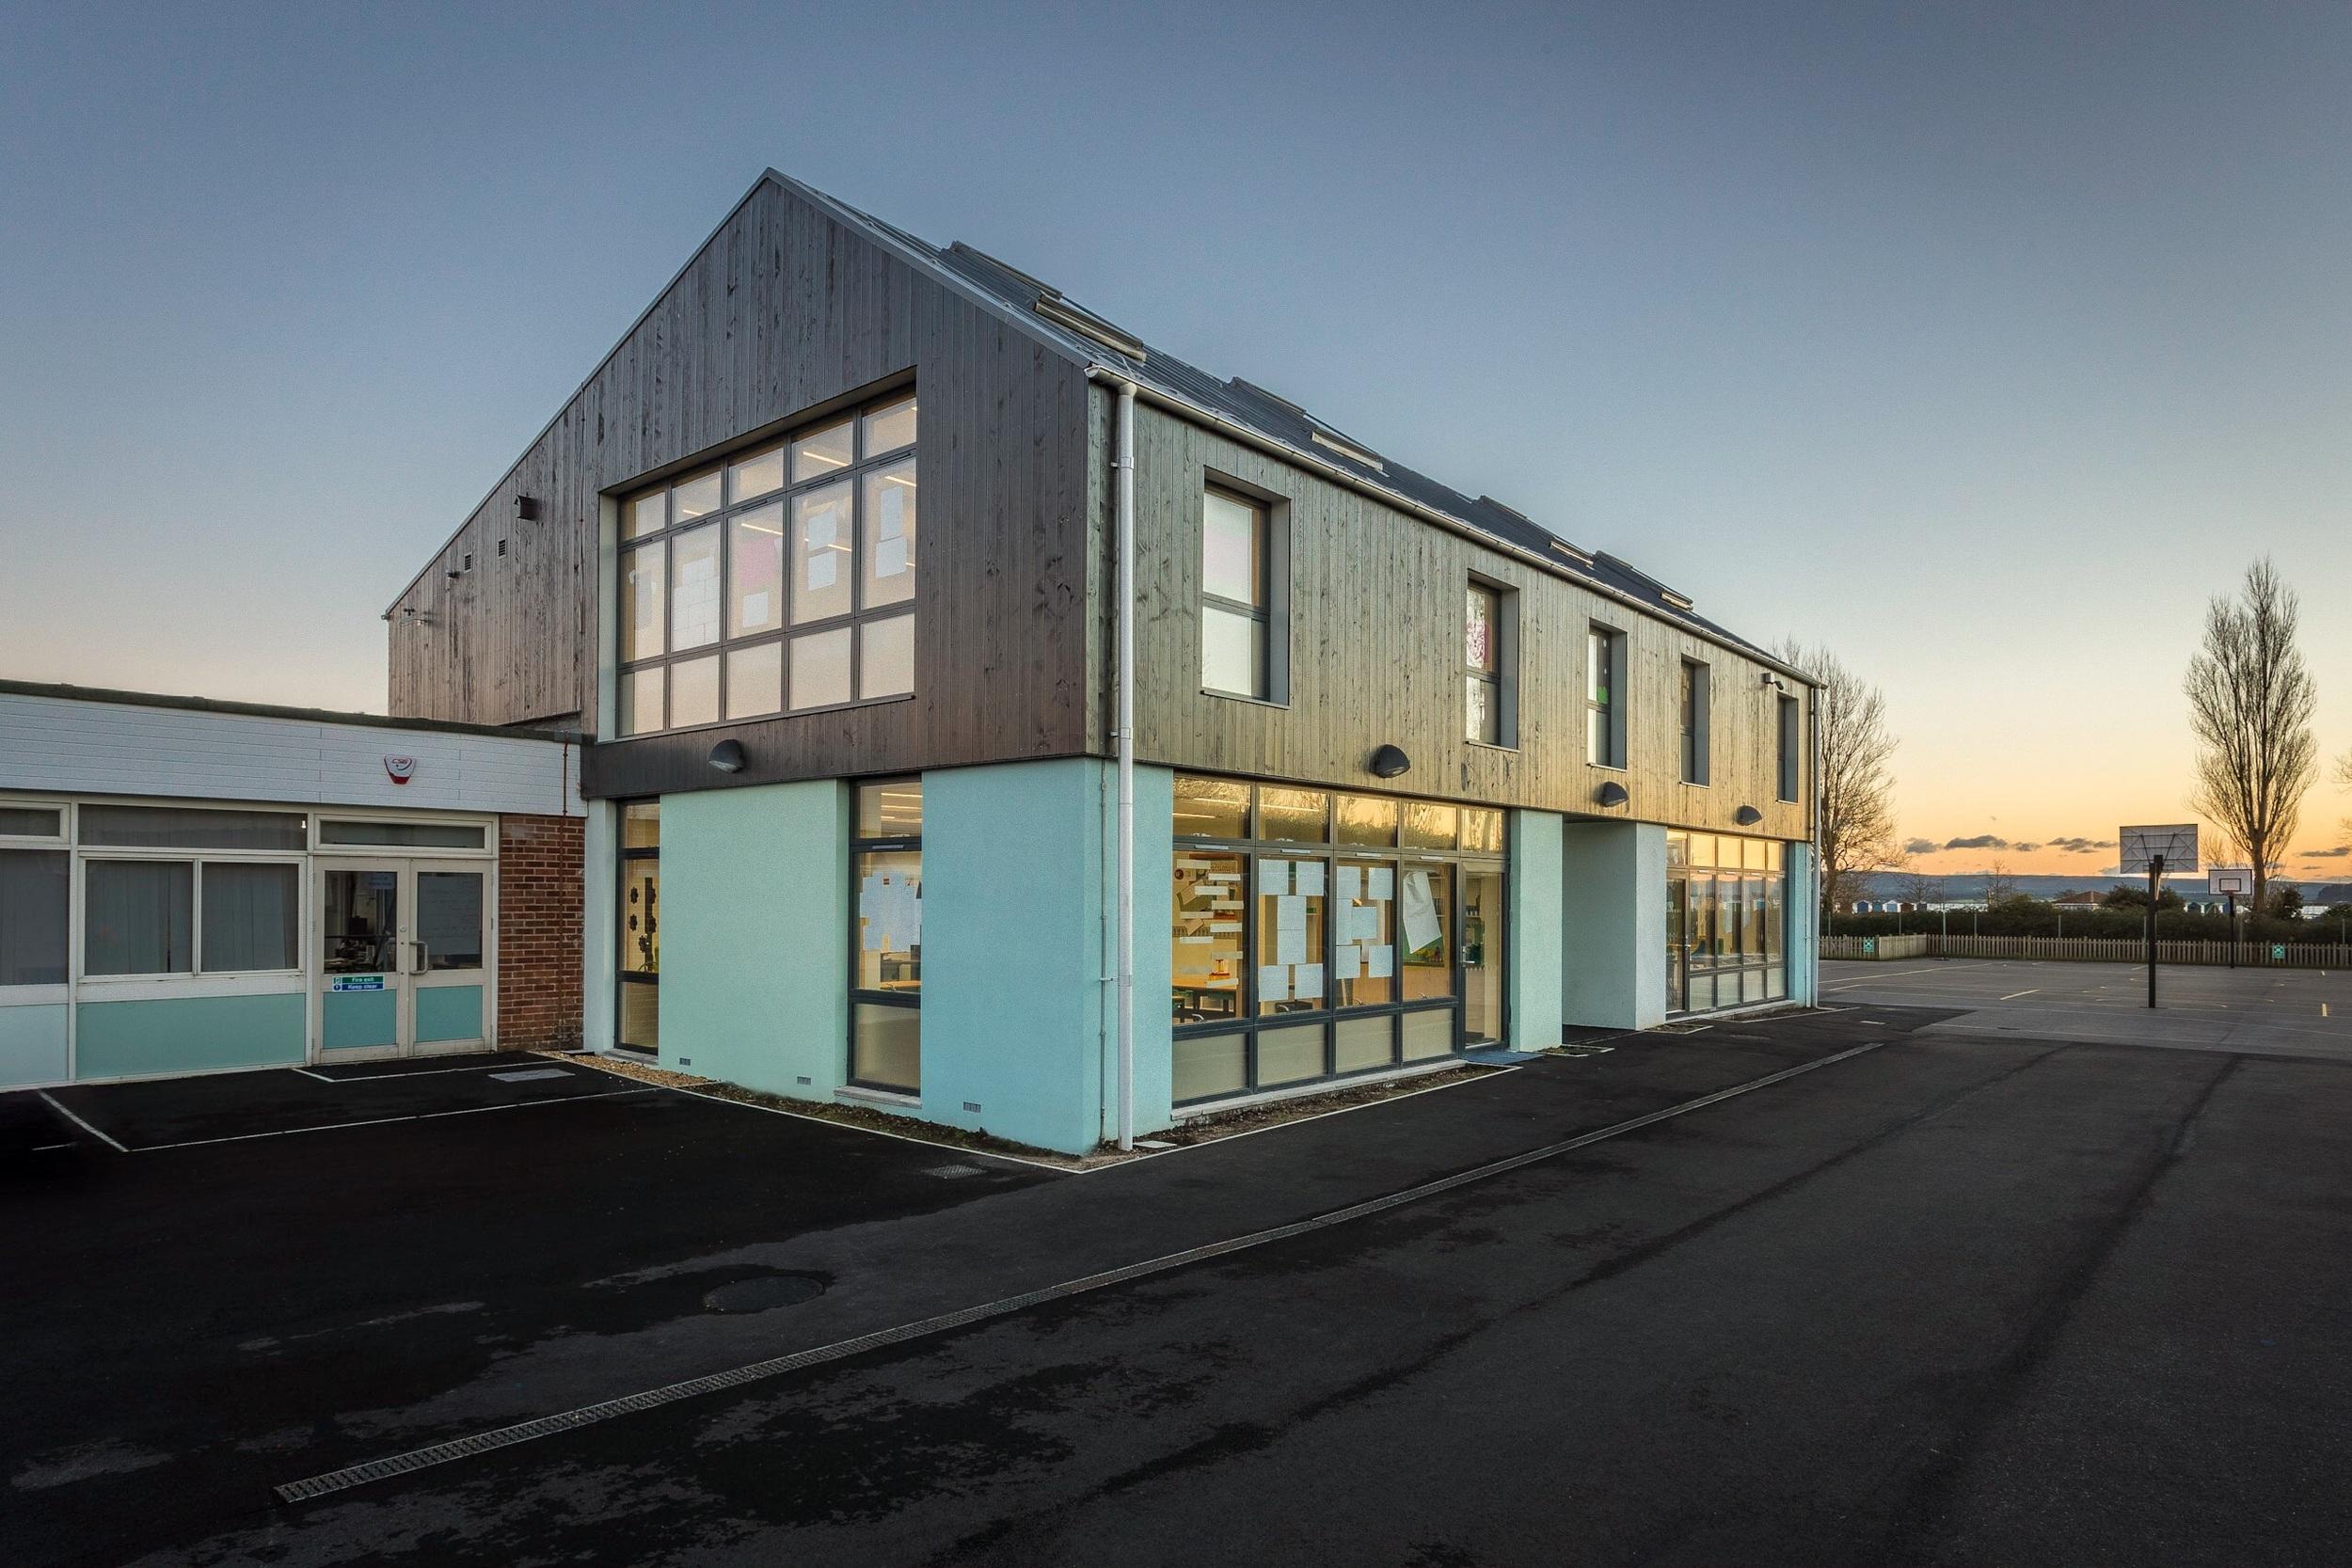 Hamworthy Park Junior School, Poole, Dorset, photographed for the architect Kendall Kingscott